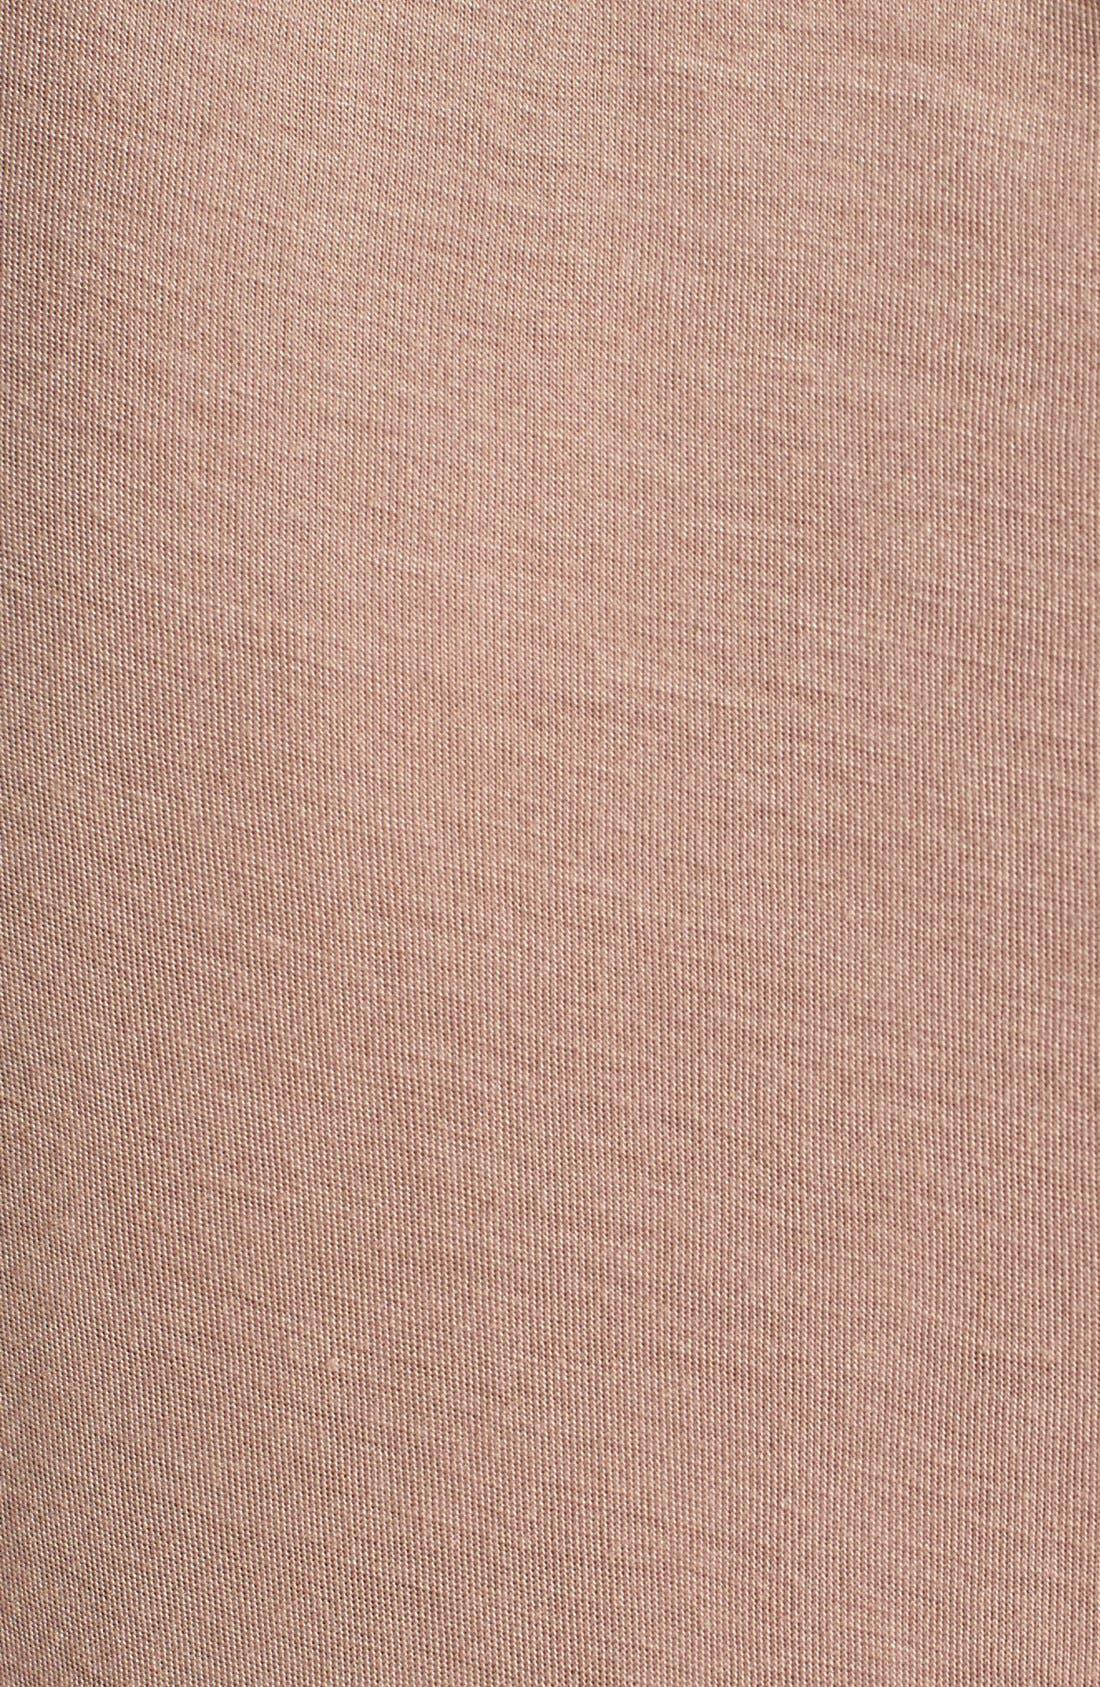 Alternate Image 3  - LAmade 'Juliet' Tencel® Wrap Front Top